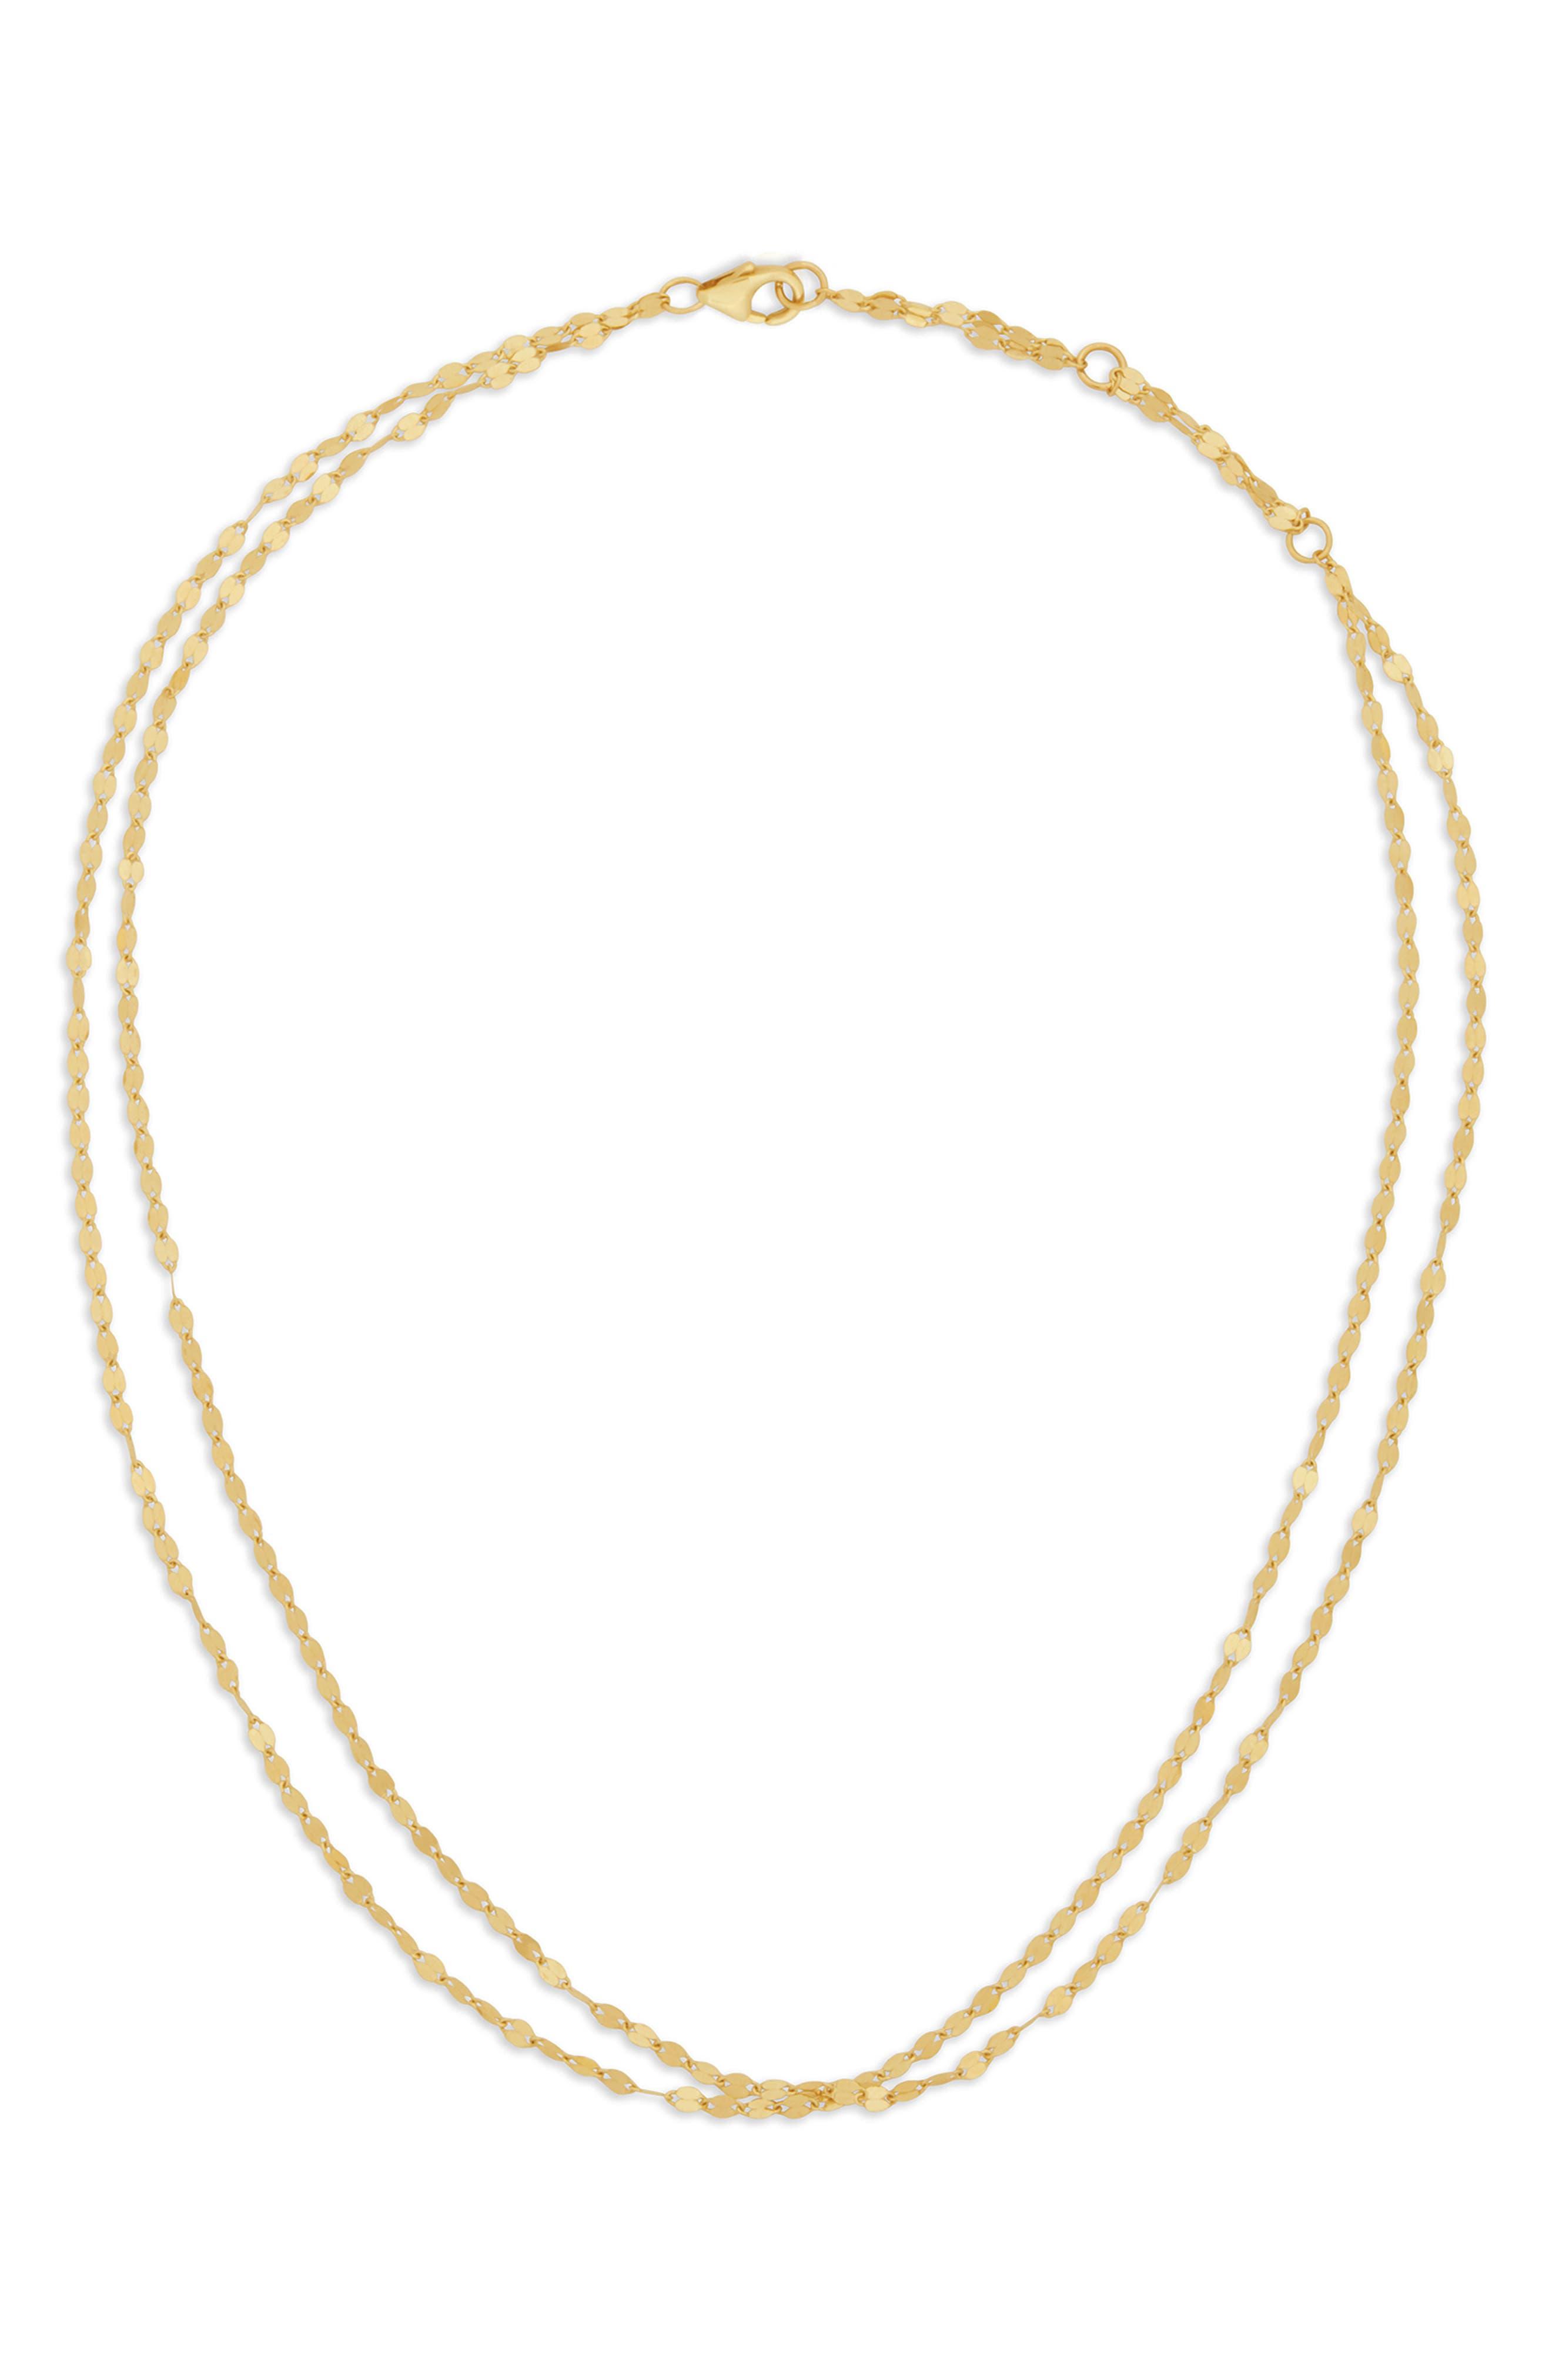 Alias Double Blake Short Necklace,                             Main thumbnail 1, color,                             Yellow Gold